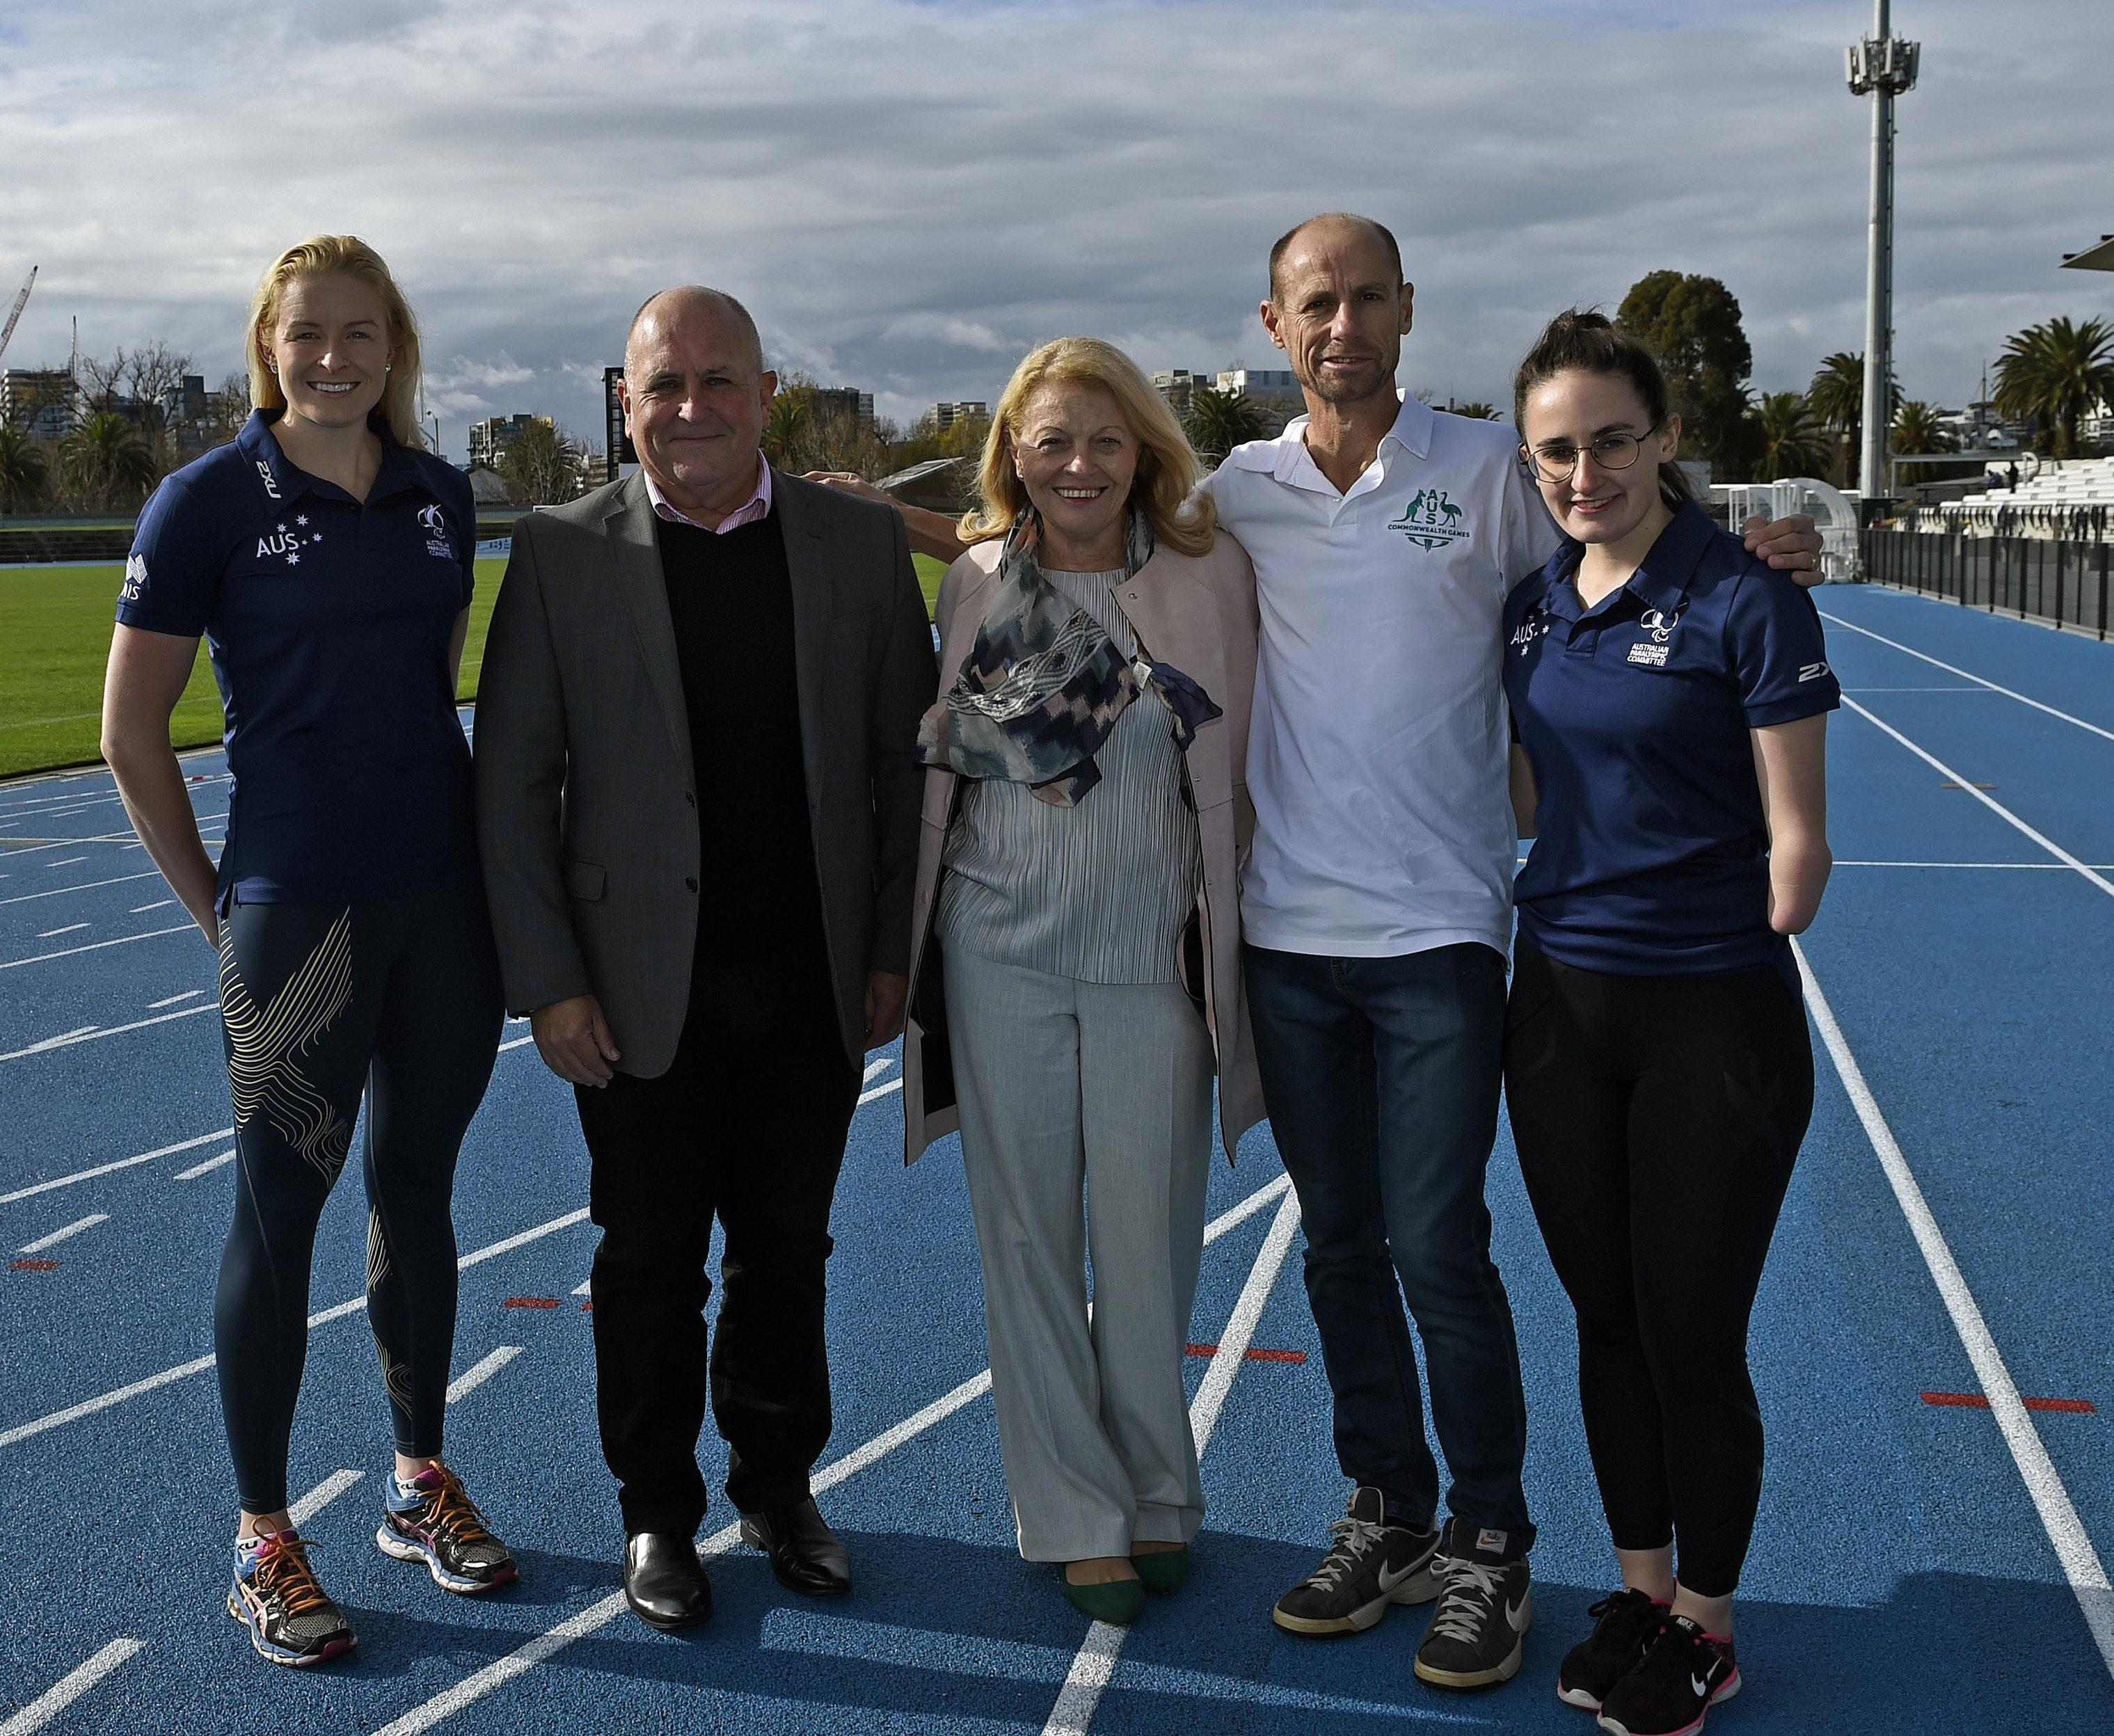 Commonwealth Games Australia Will Provide $13 Million For